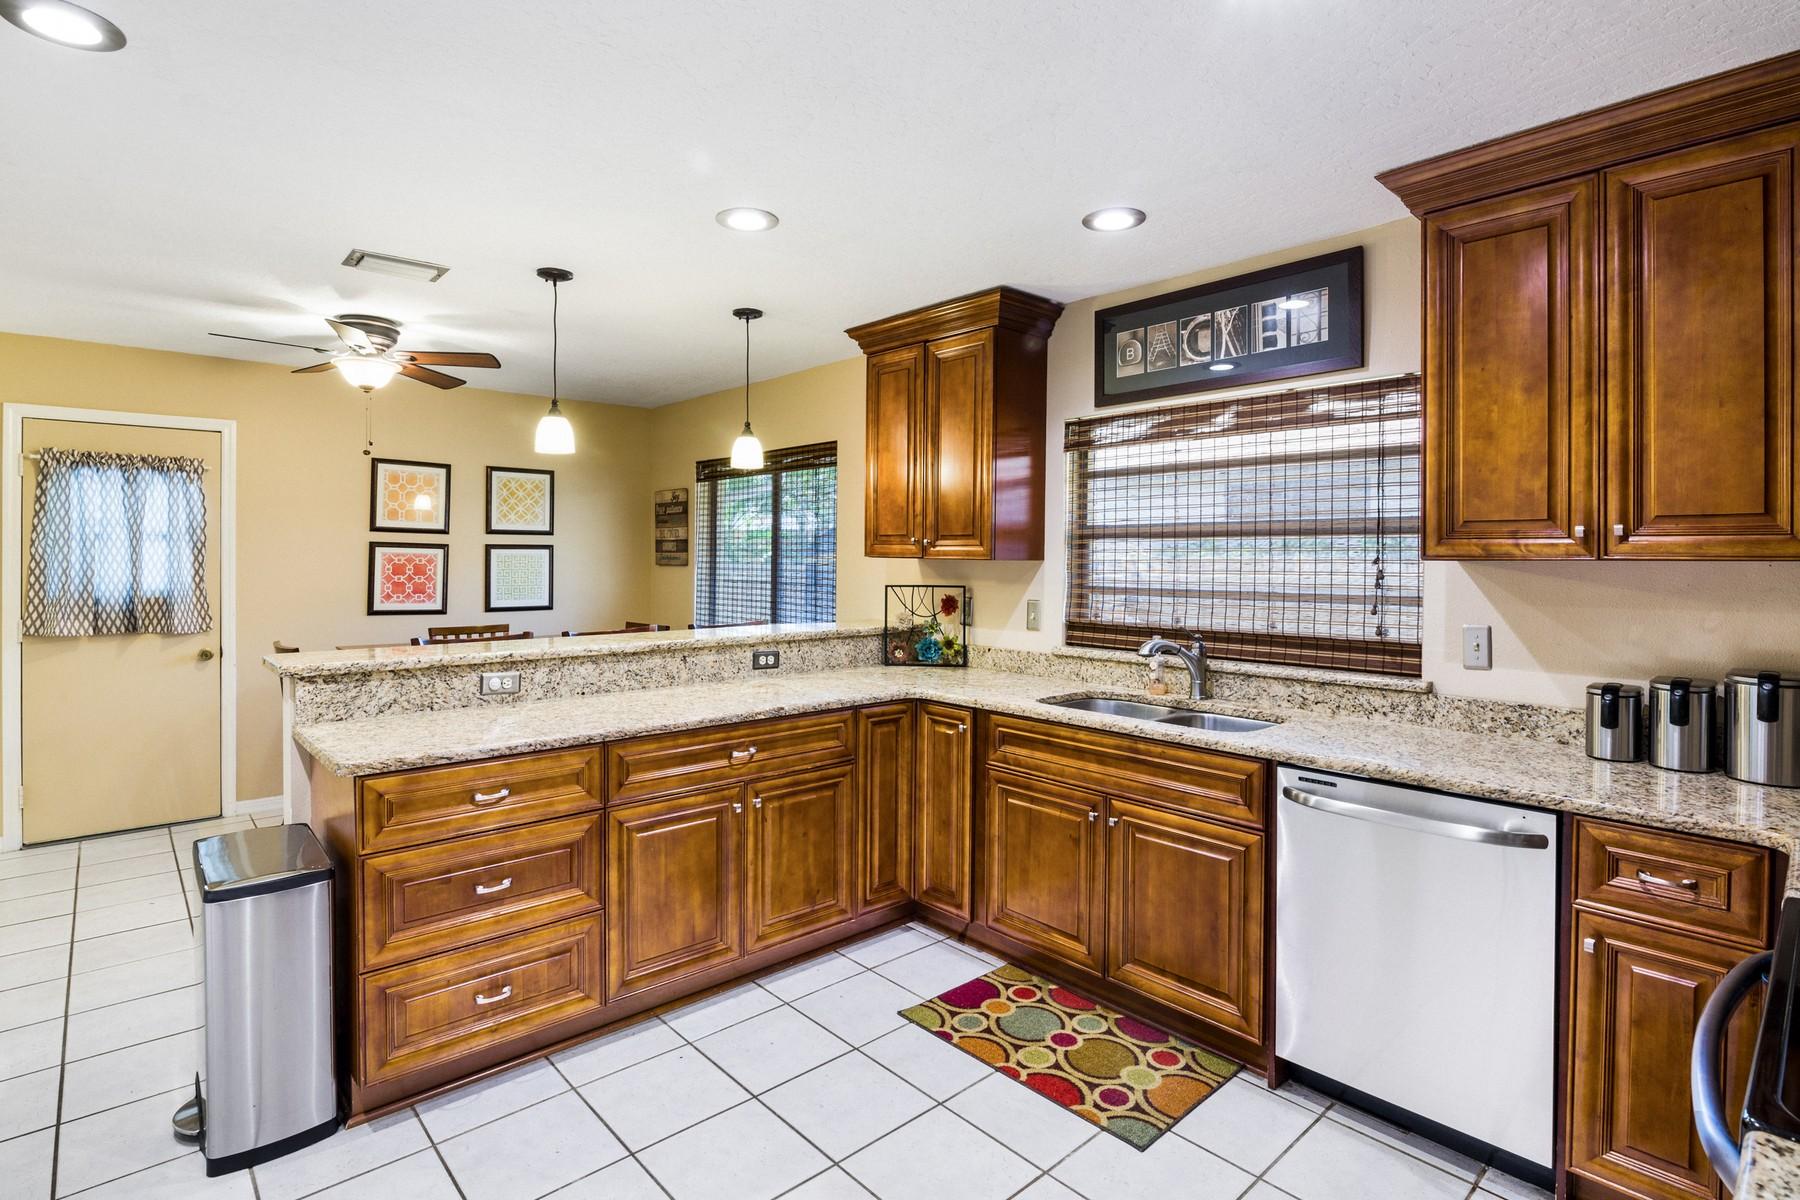 Additional photo for property listing at Tortoise View Estates 496 Tortoise View Circle Satellite Beach, Florida 32937 United States